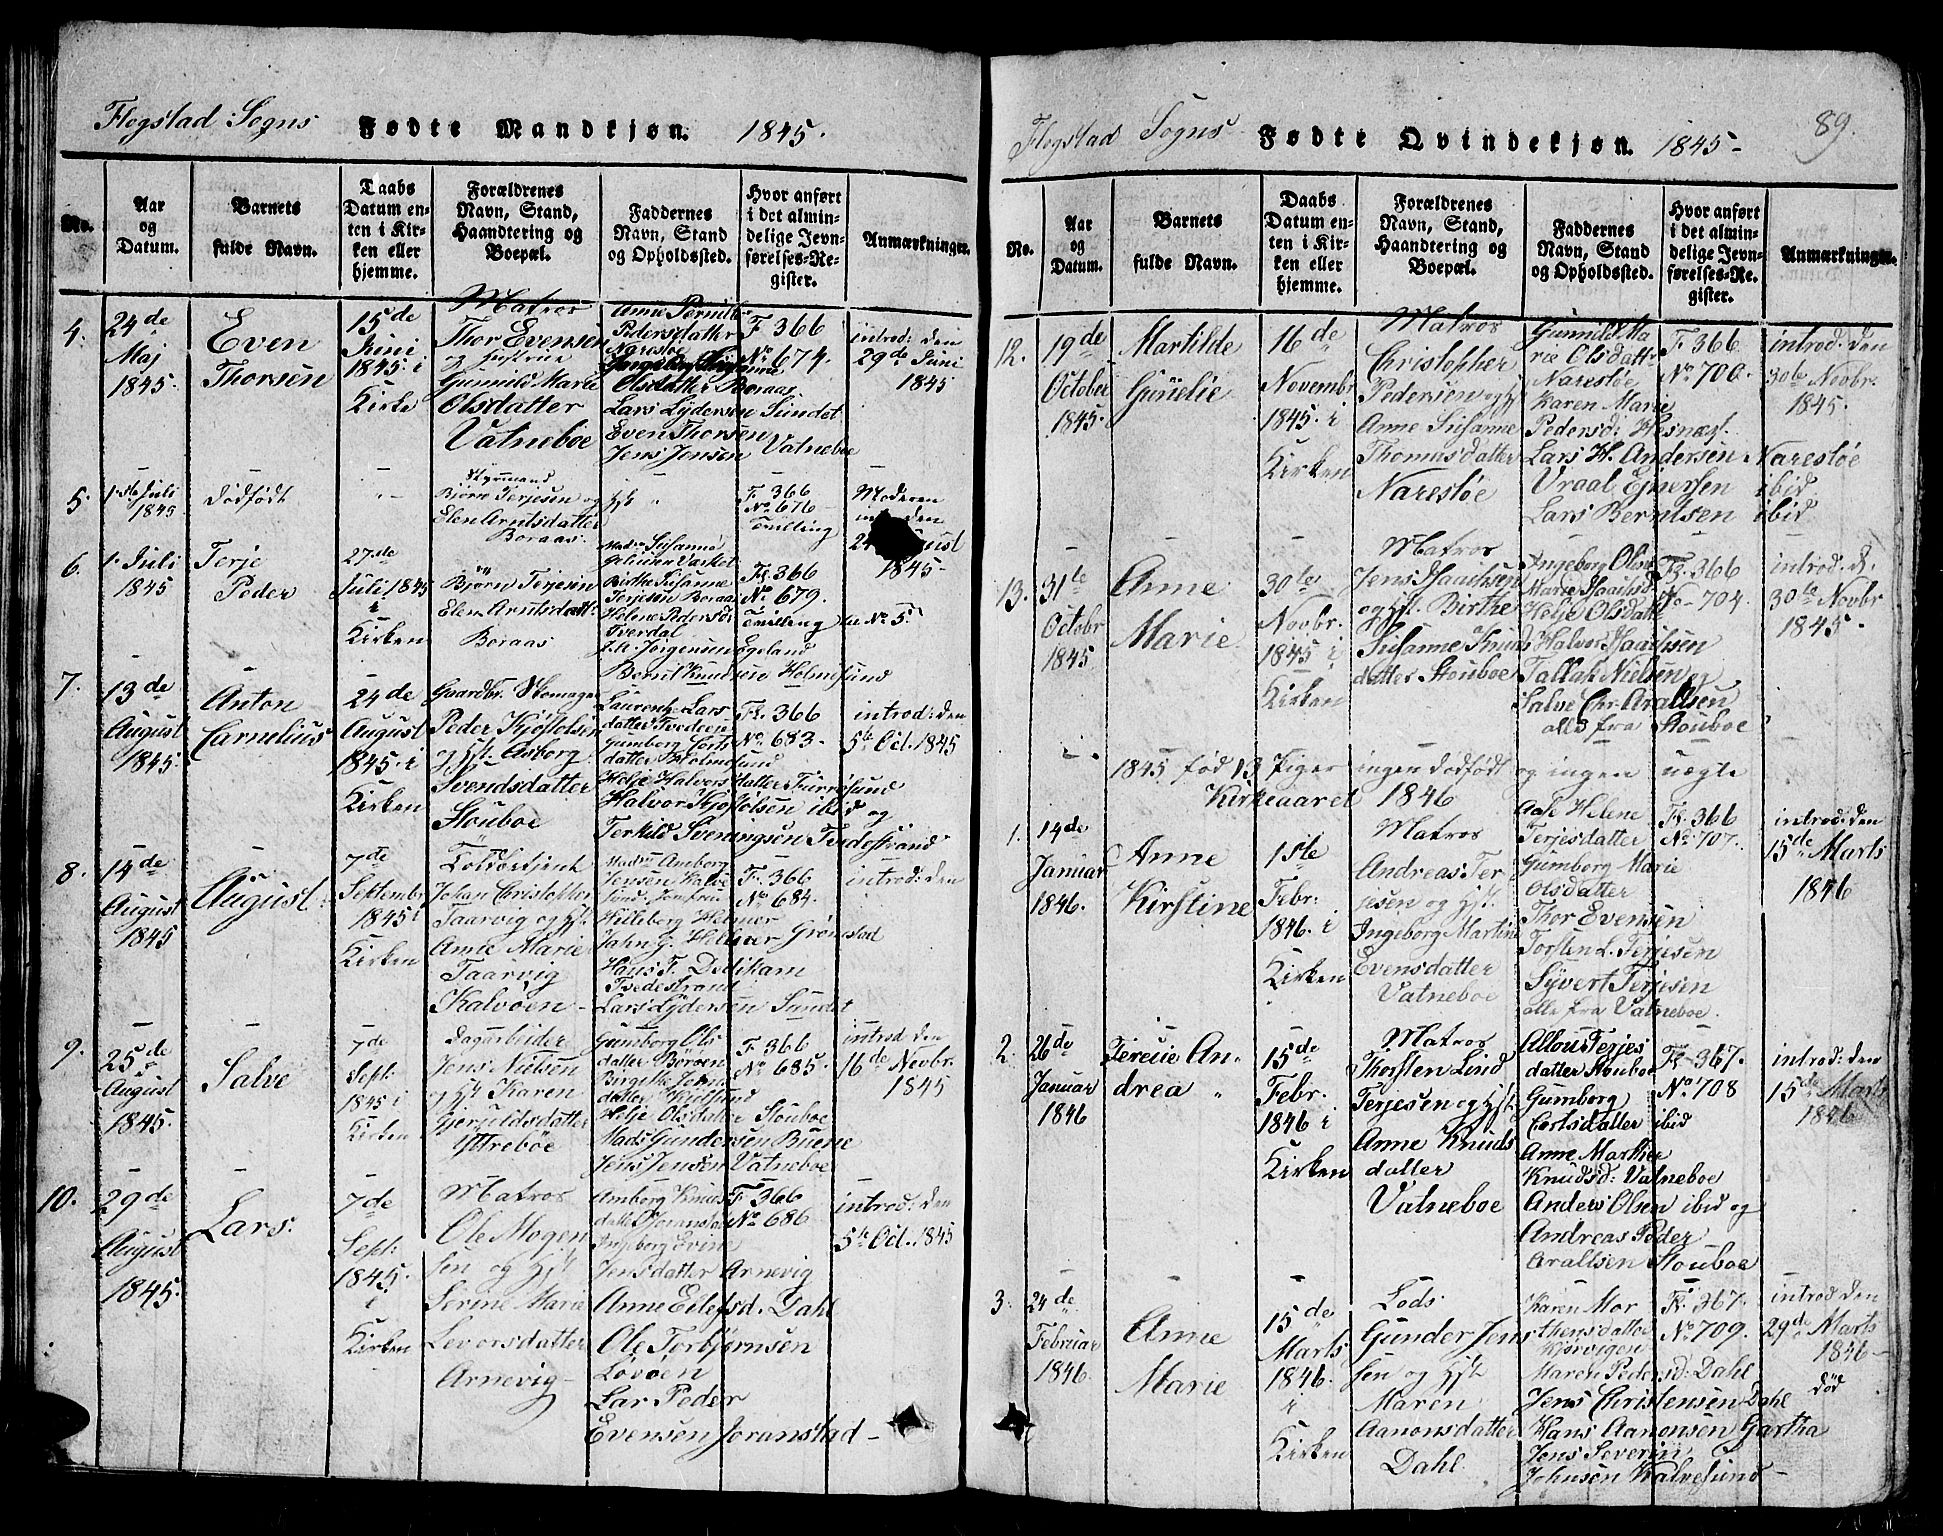 SAK, Dypvåg sokneprestkontor, F/Fb/Fbb/L0001: Klokkerbok nr. B 1, 1816-1850, s. 89